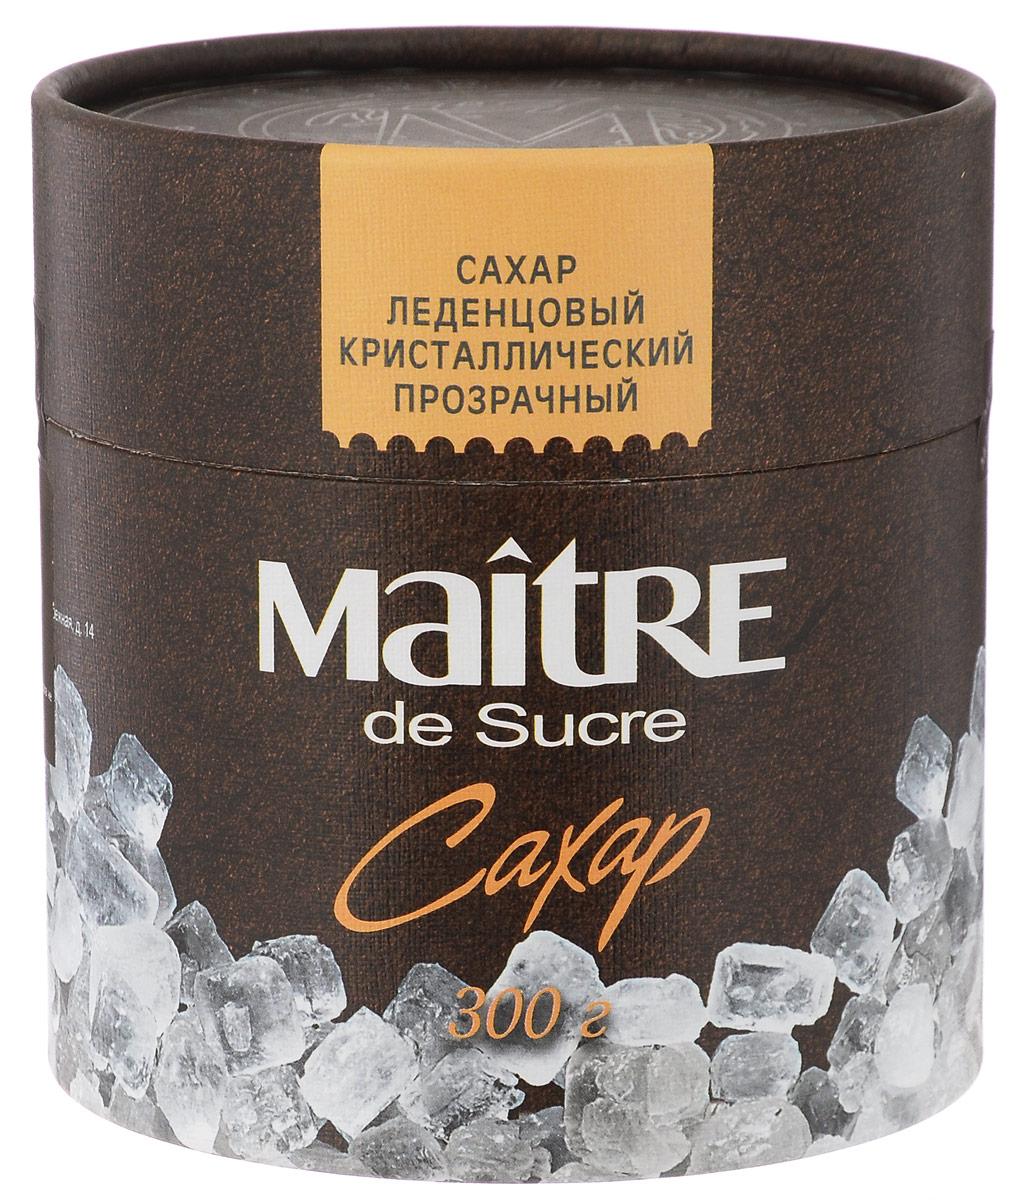 Maitre de Sucre сахар леденцовый прозрачный кристаллический, 300 г комбинезон suggest by pain de sucre